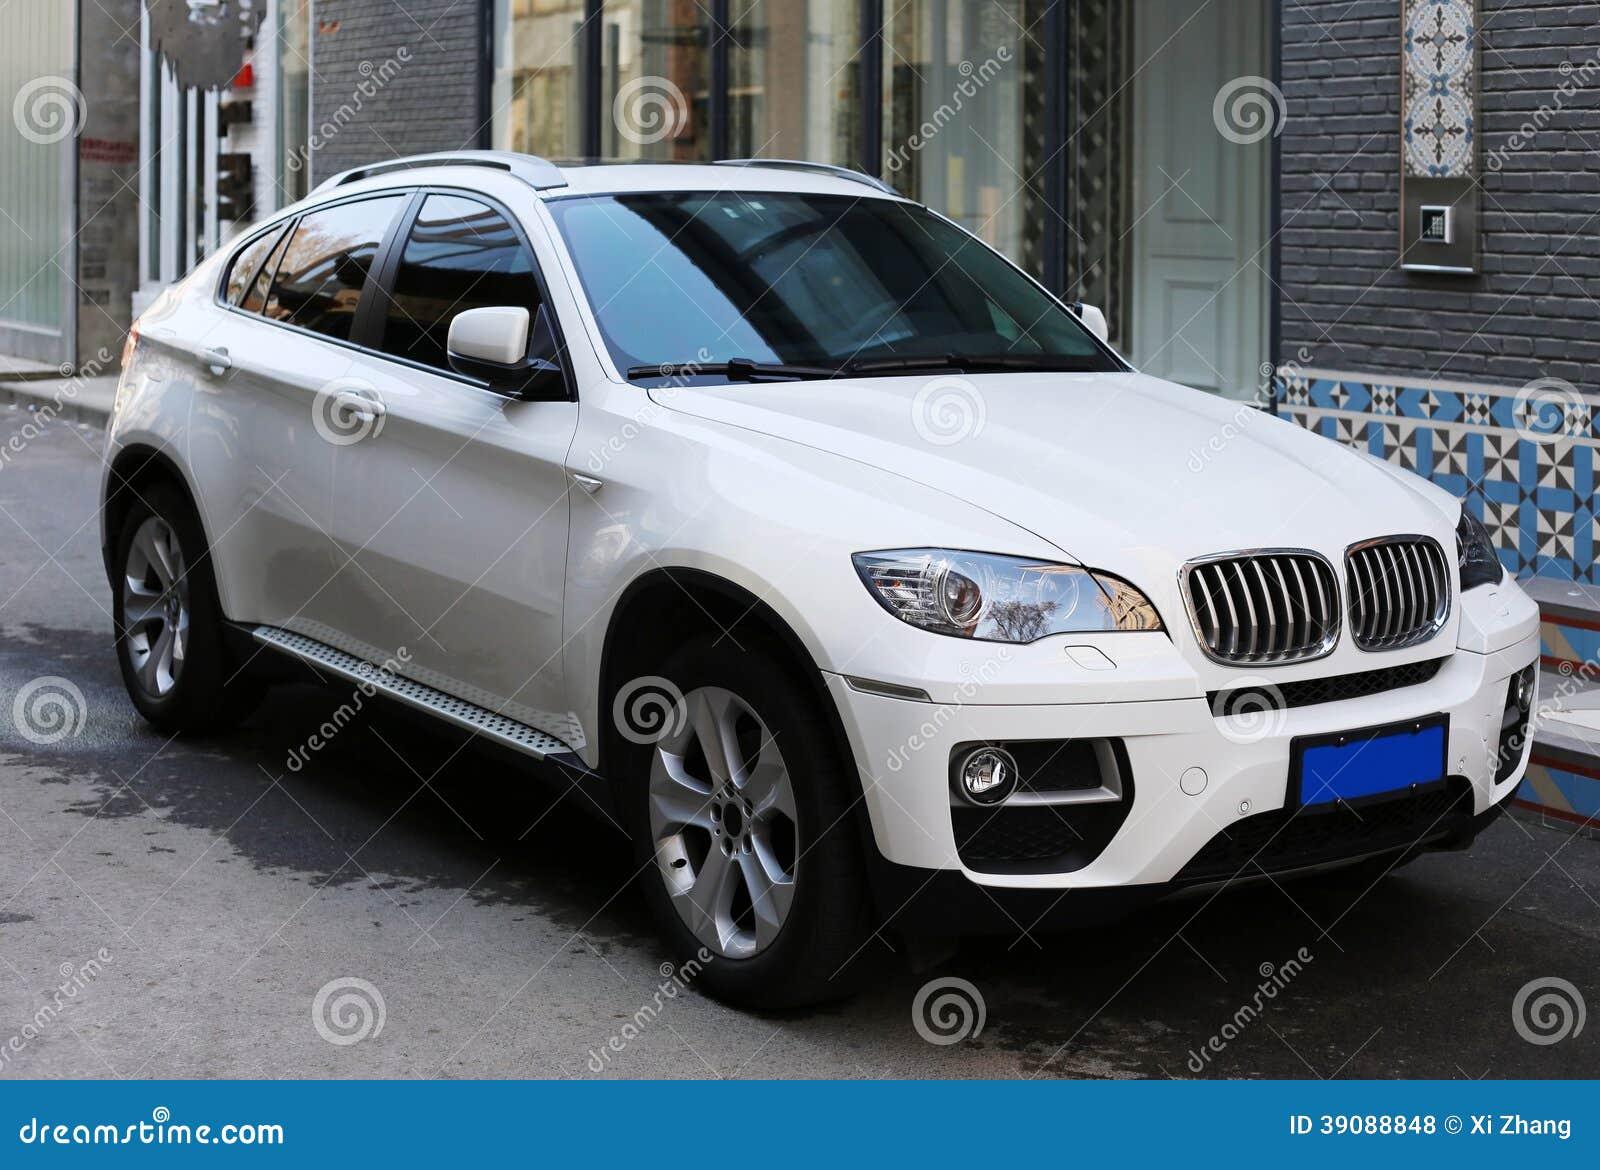 Bmw Suv Stock Photo Image Of Building White Automobile